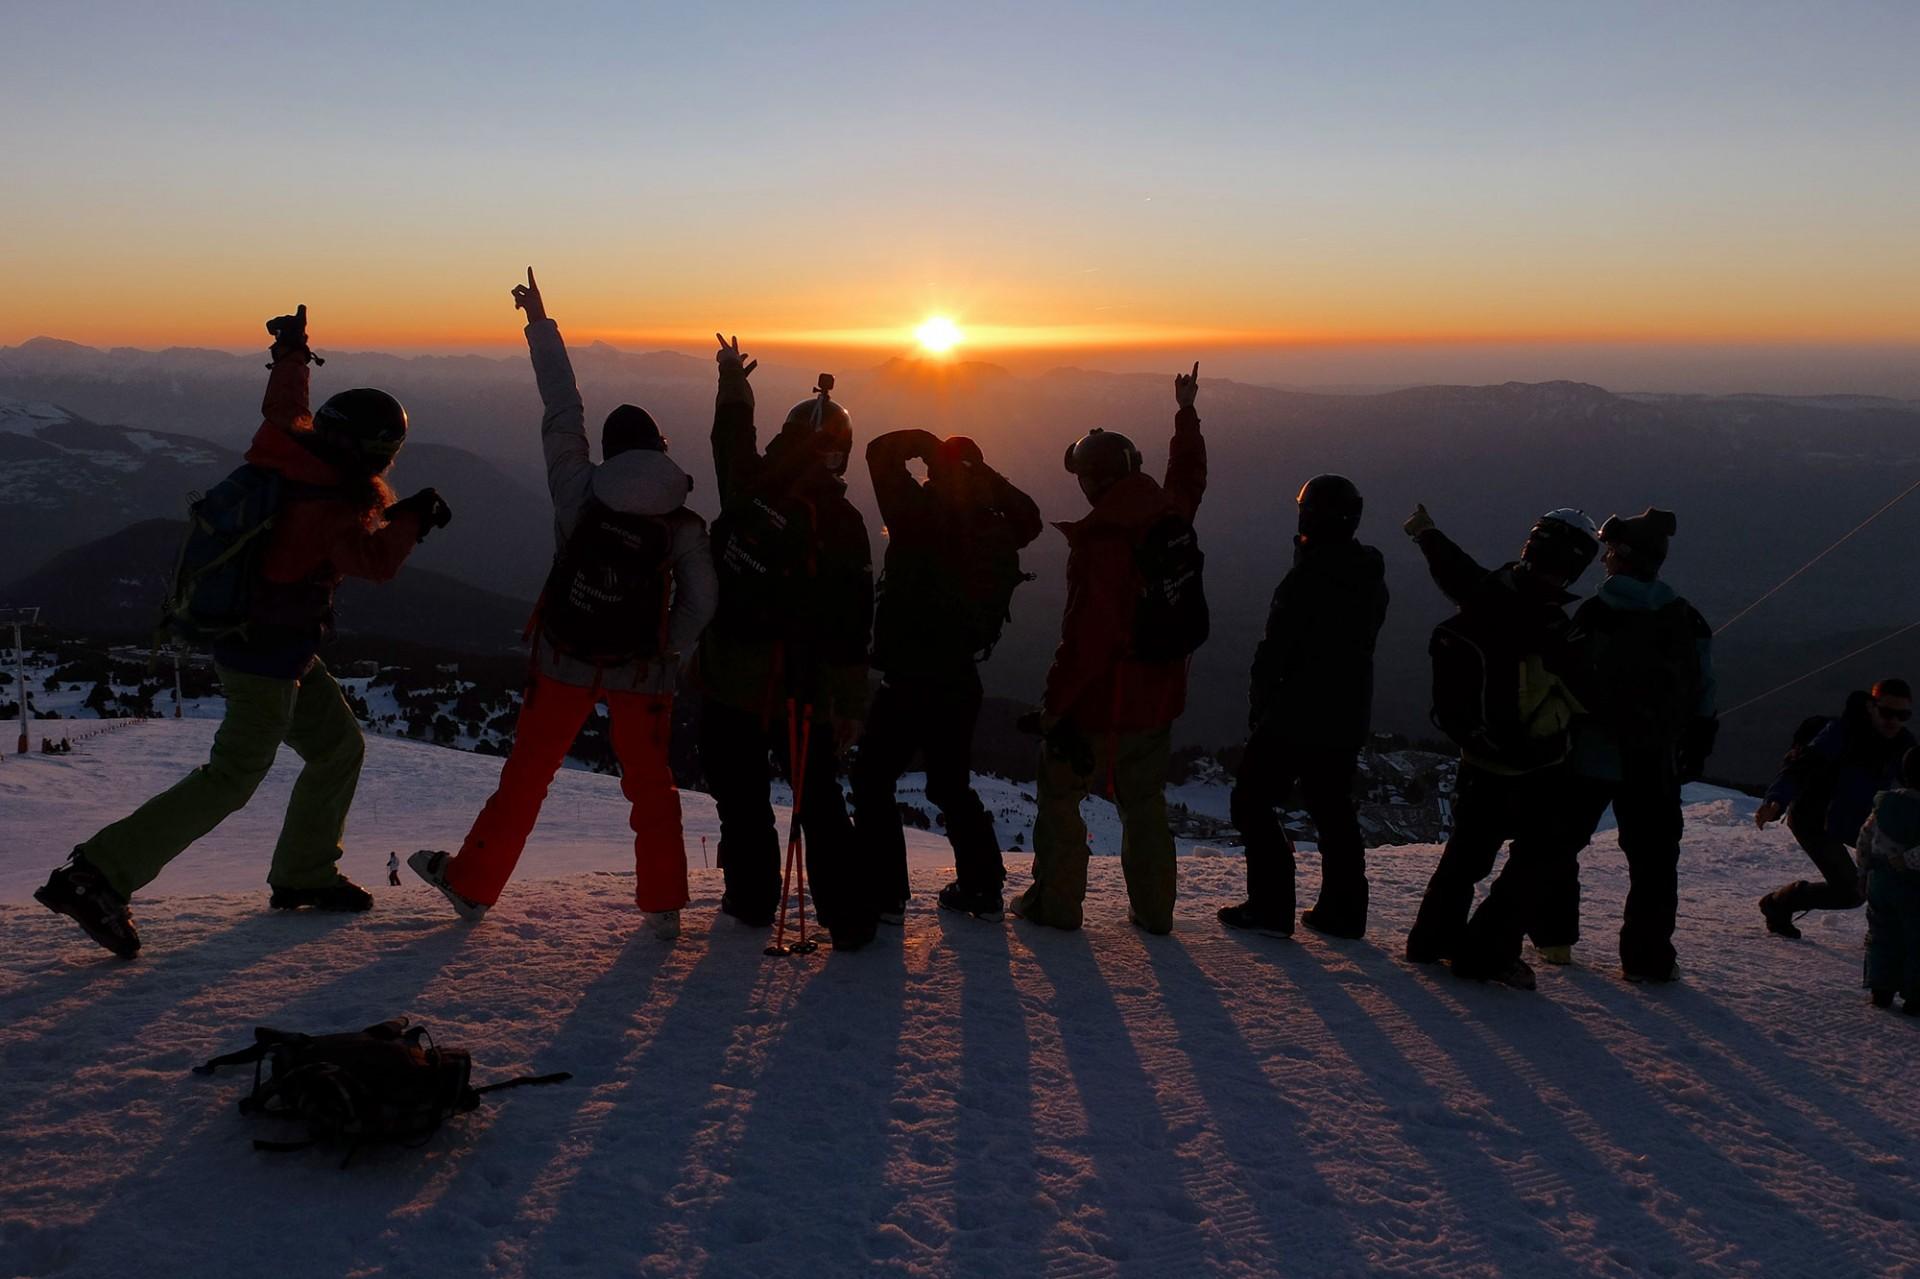 Chamrousse ski nocturne fondue test activité skipass station ski hiver isère alpes france